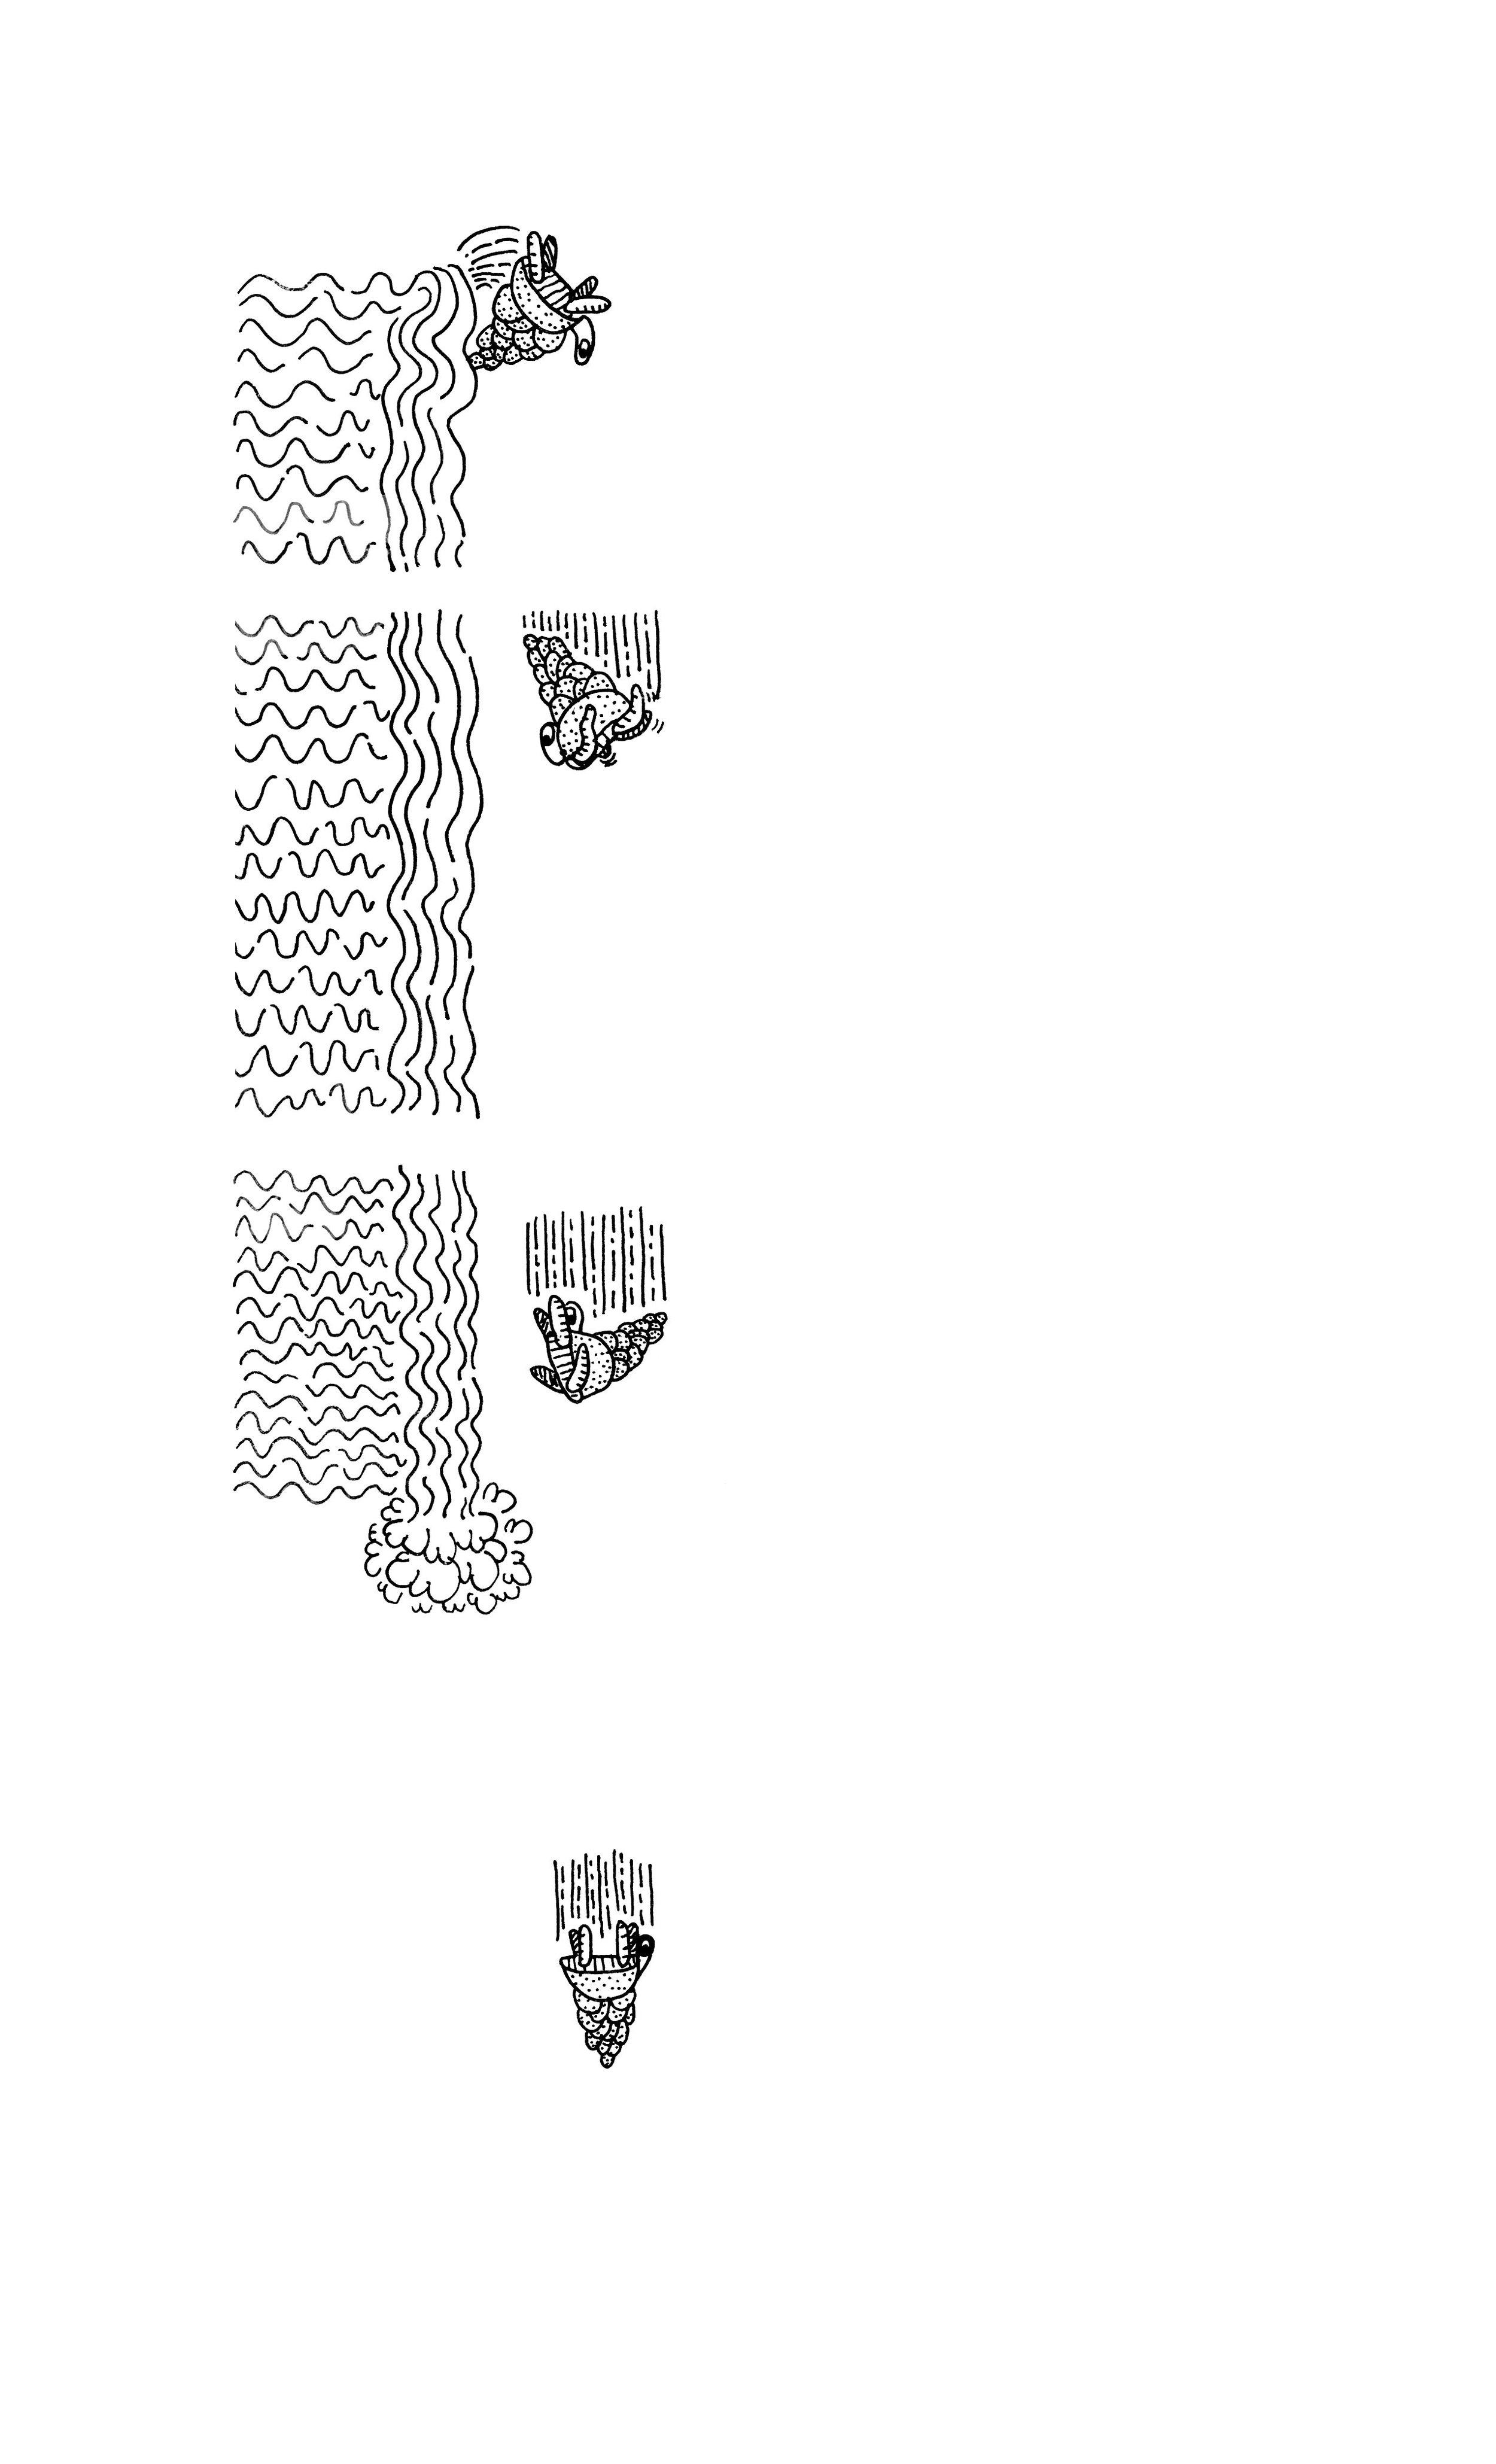 oscillator_page14.jpg